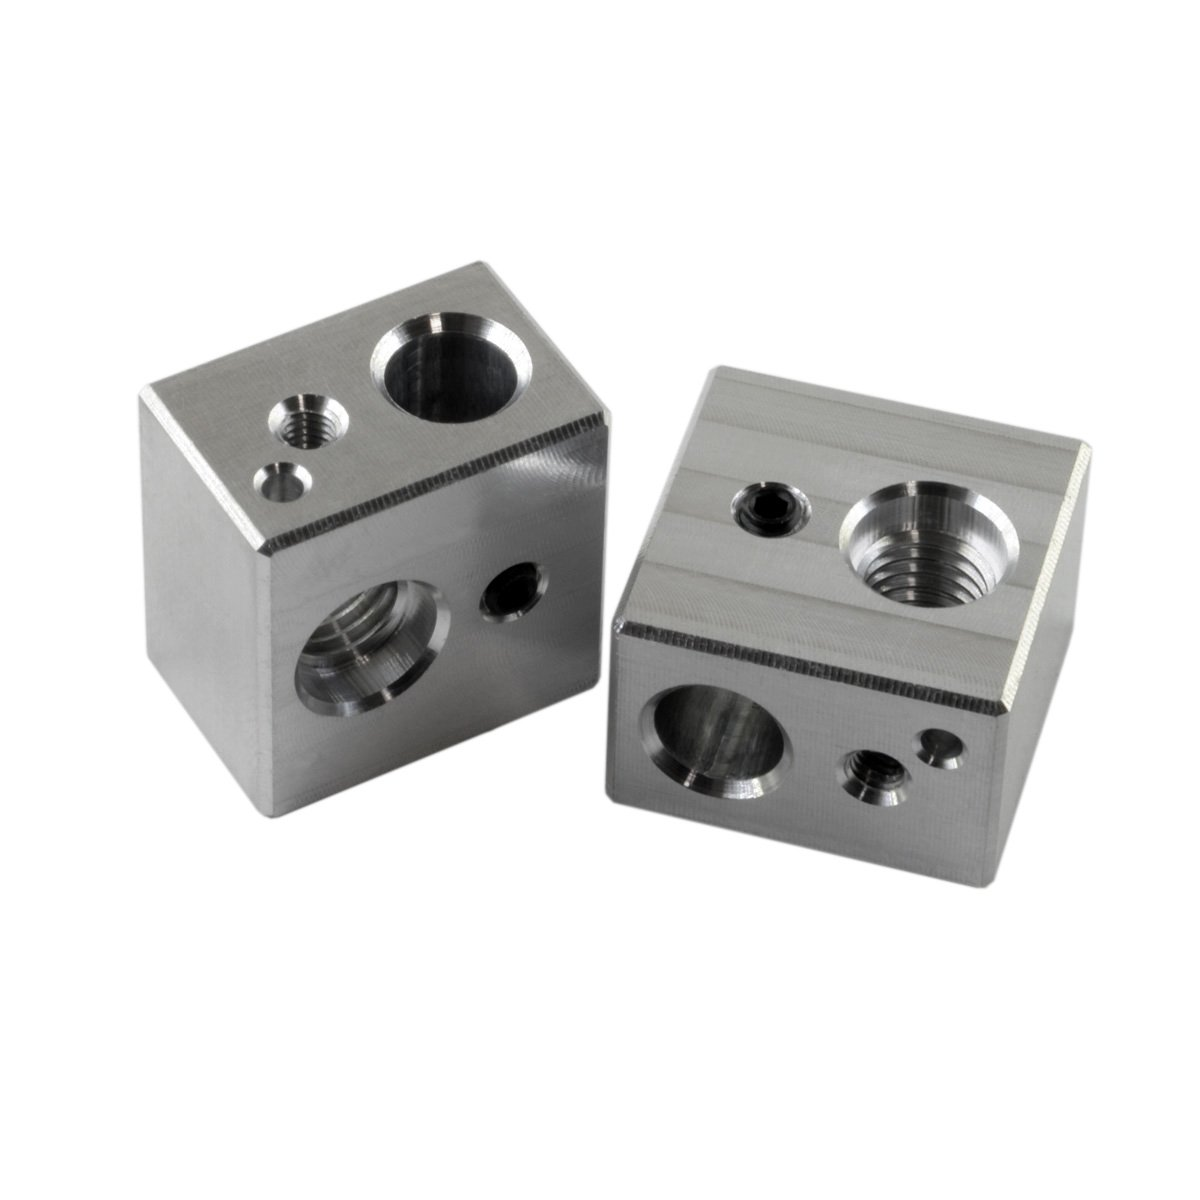 Amazon.com: [Gulfcoast Robotics] 2 piezas MK10 extrusor ...